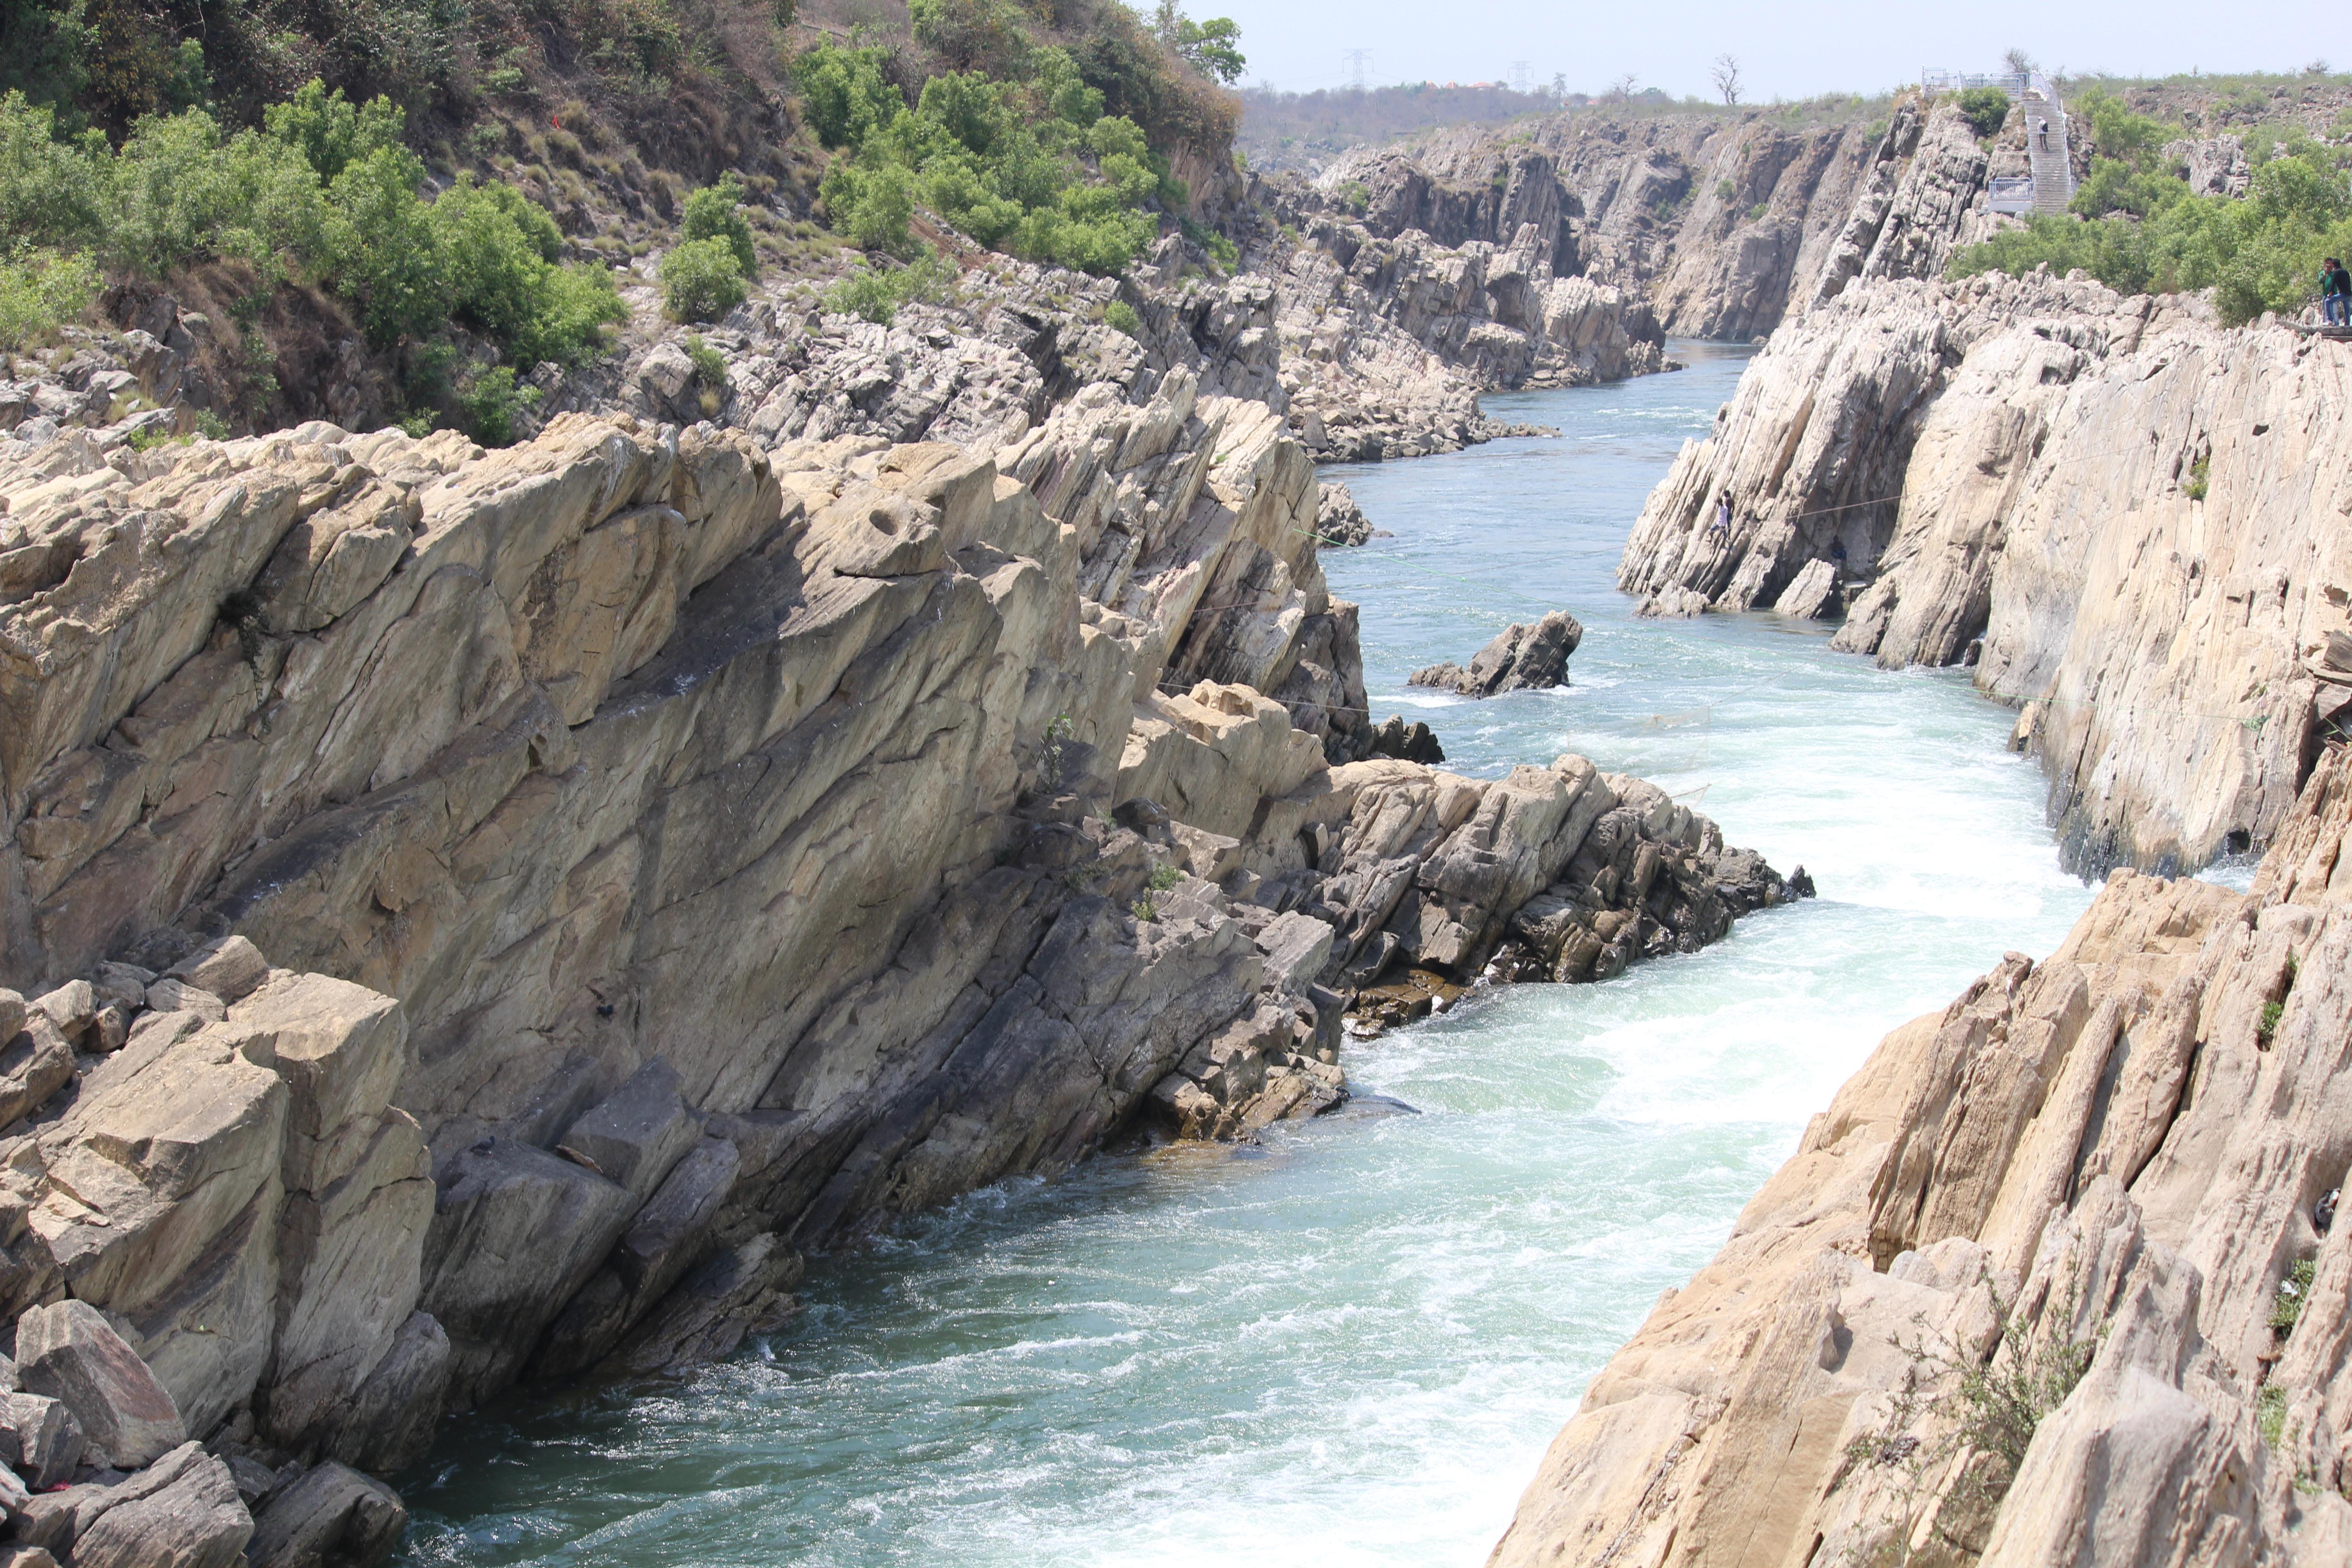 File:Section of Narmada River near Bhedaghat, Jabalpur.jpg ...